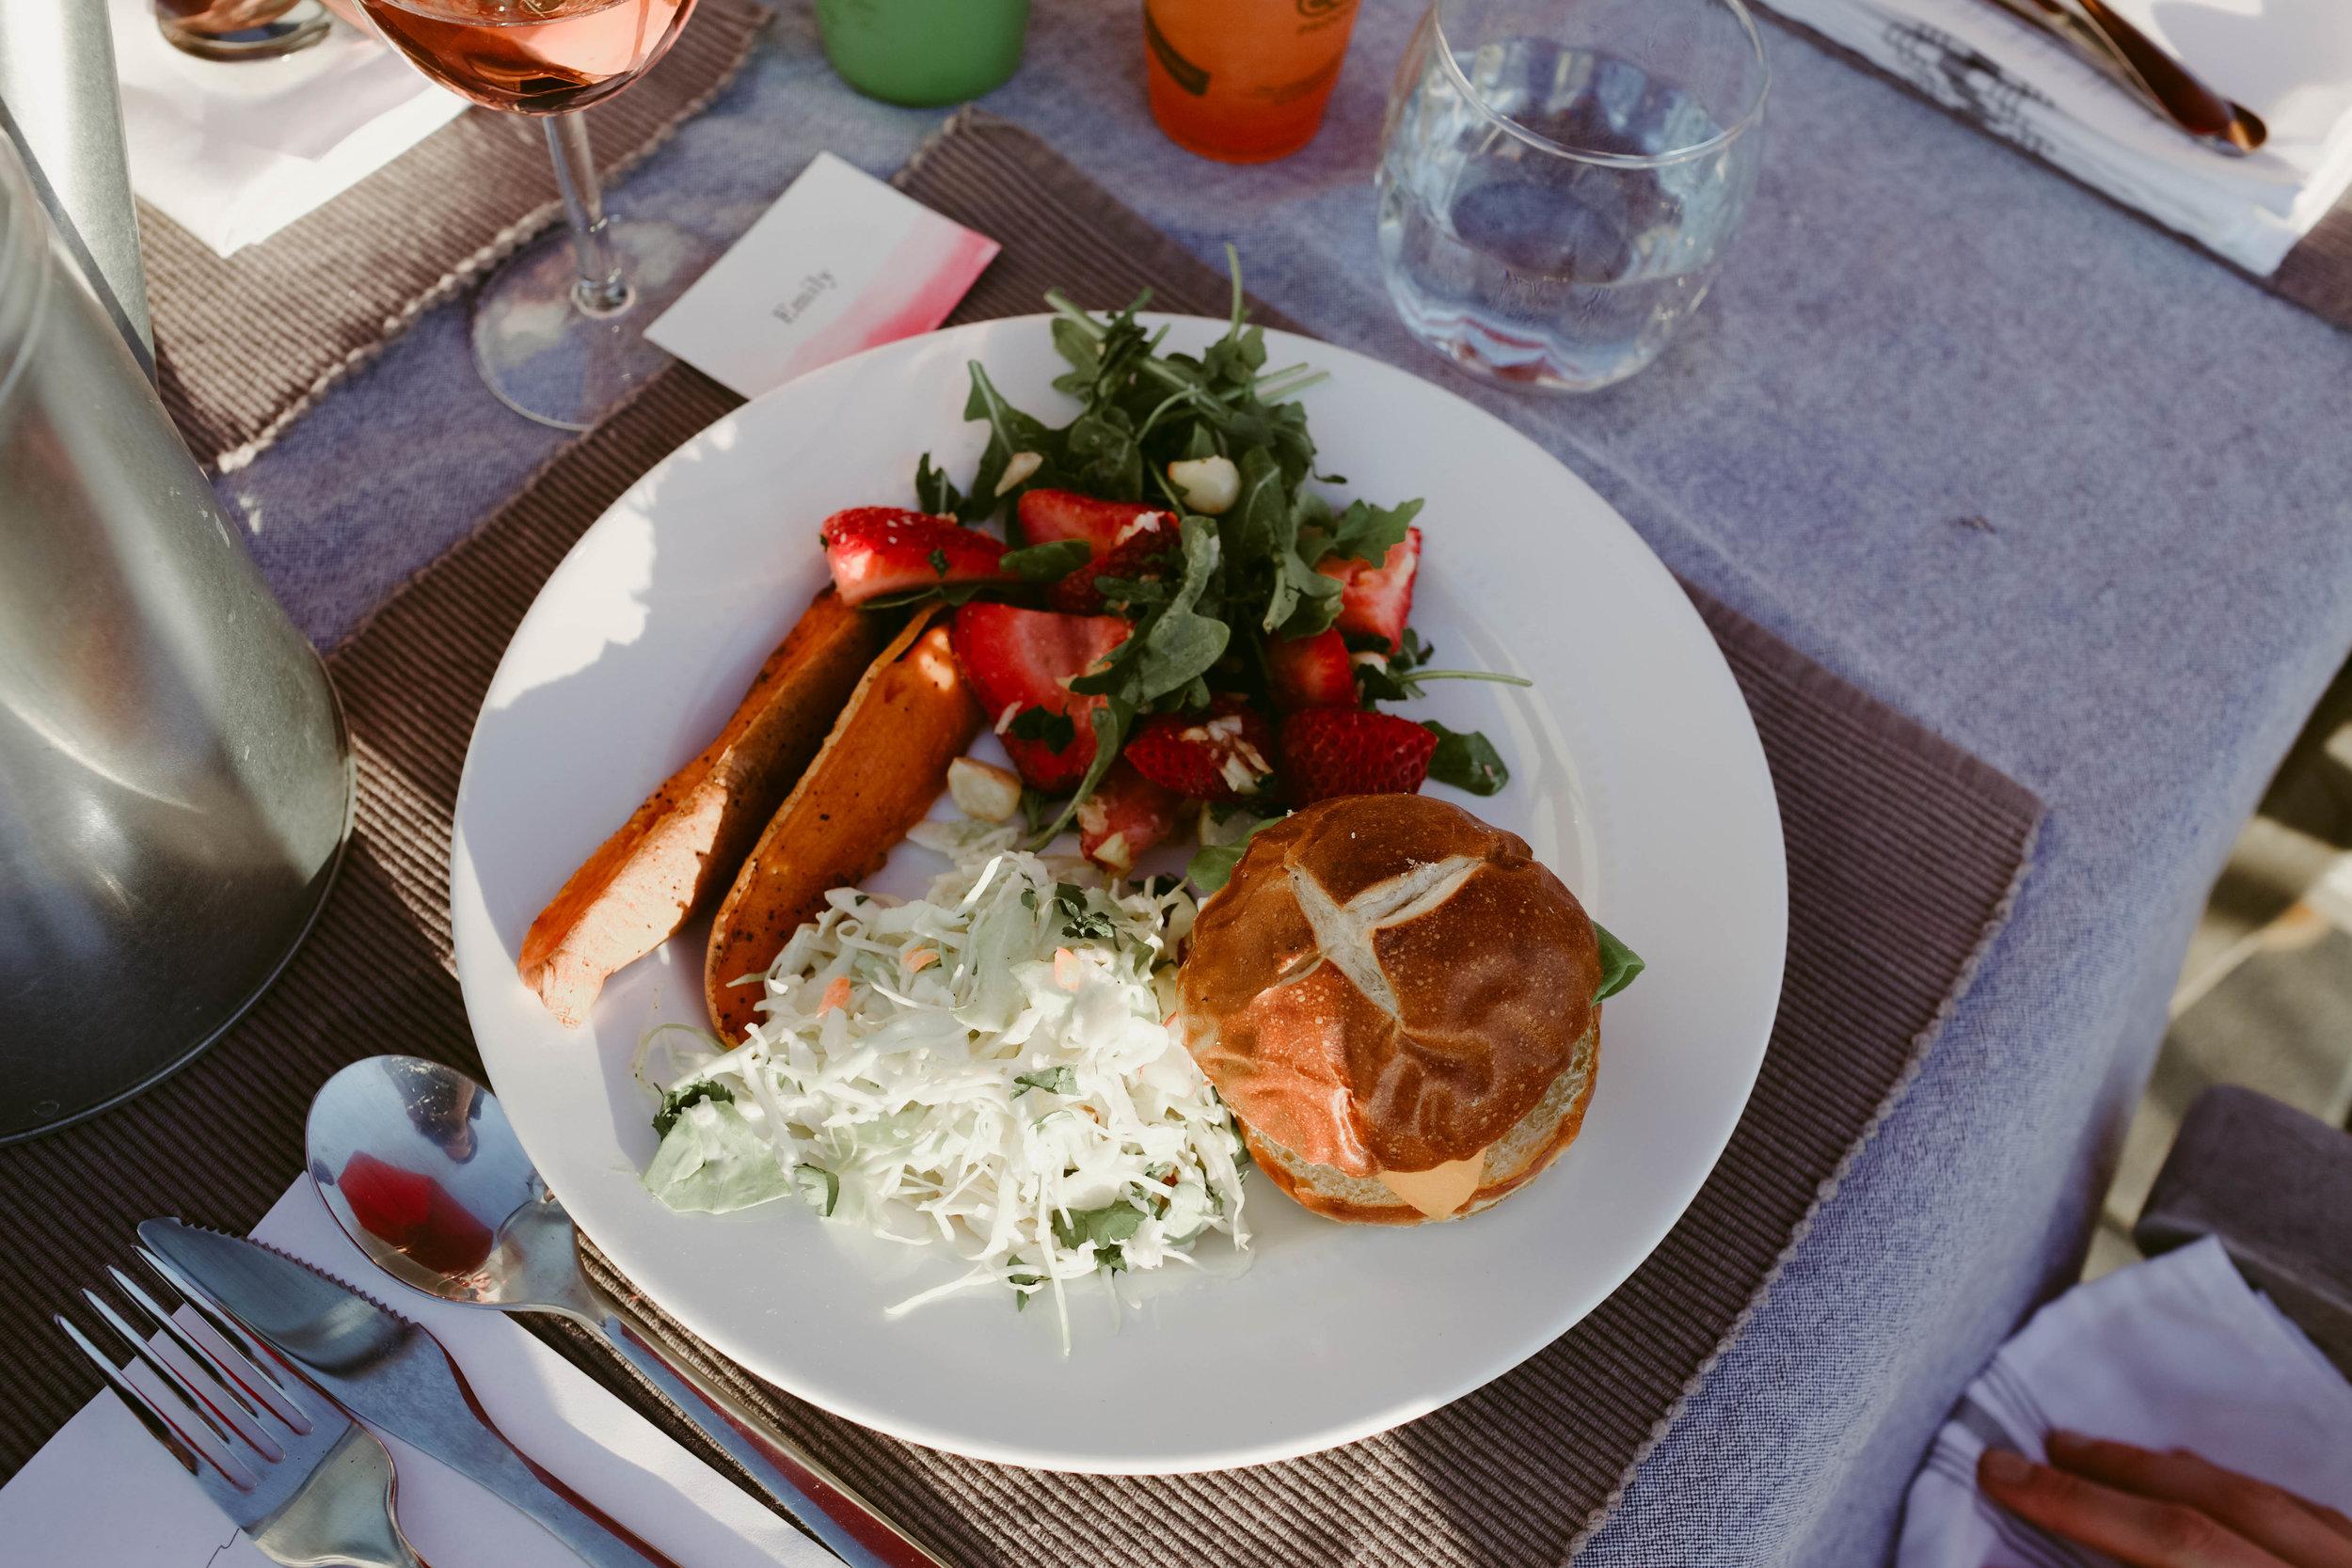 dinner plate // sweet potato burger, strawberry mint and macedamia nut salad, pickleback slaw, steak fries